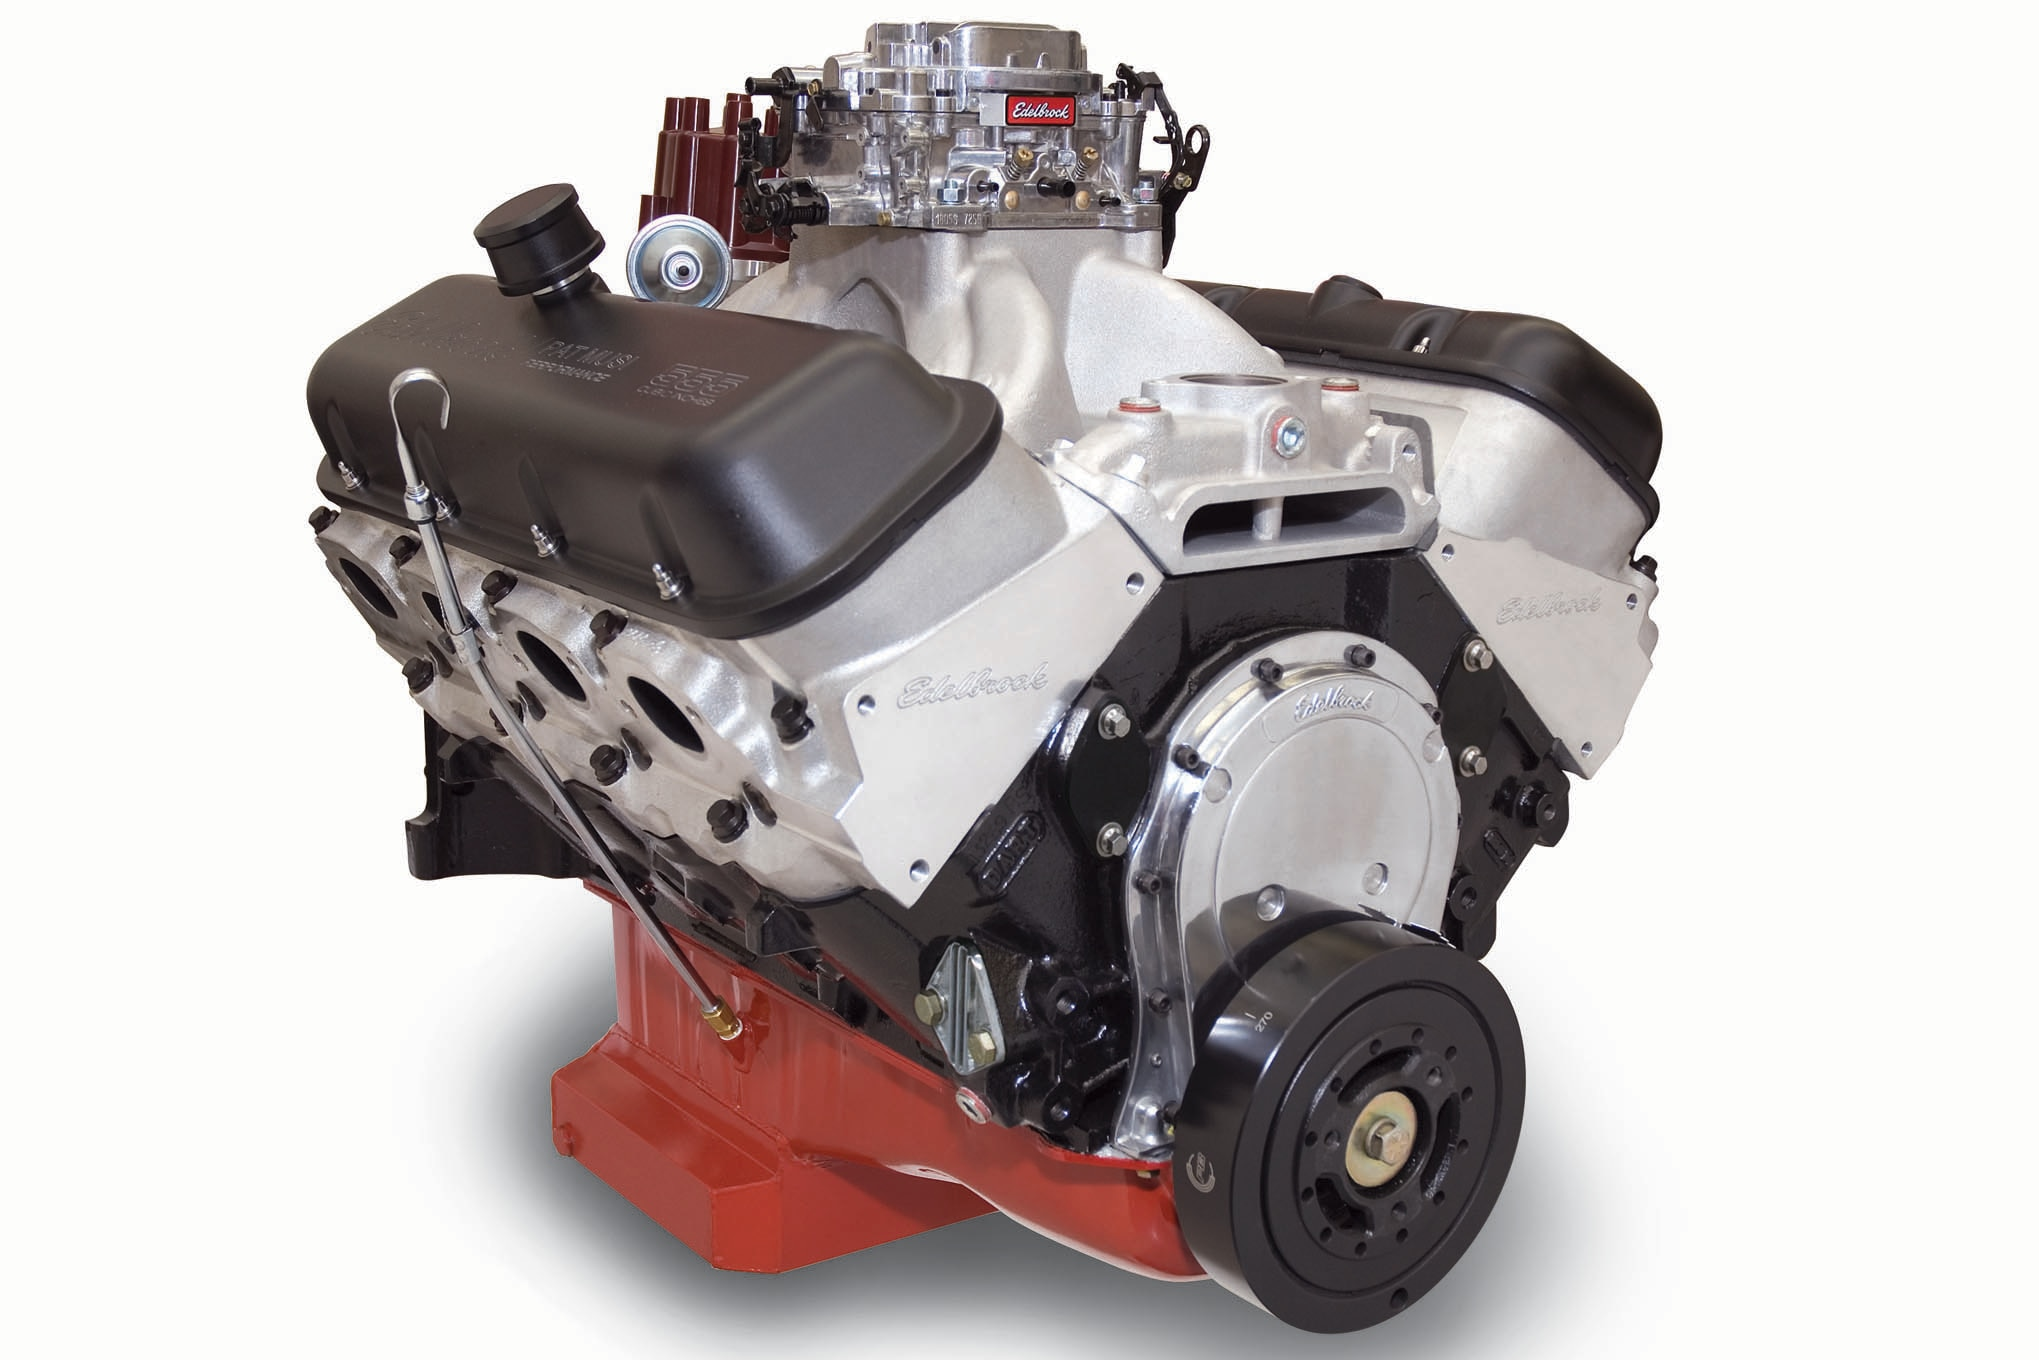 006 auto news jp jeep edelbrock pat musi engine